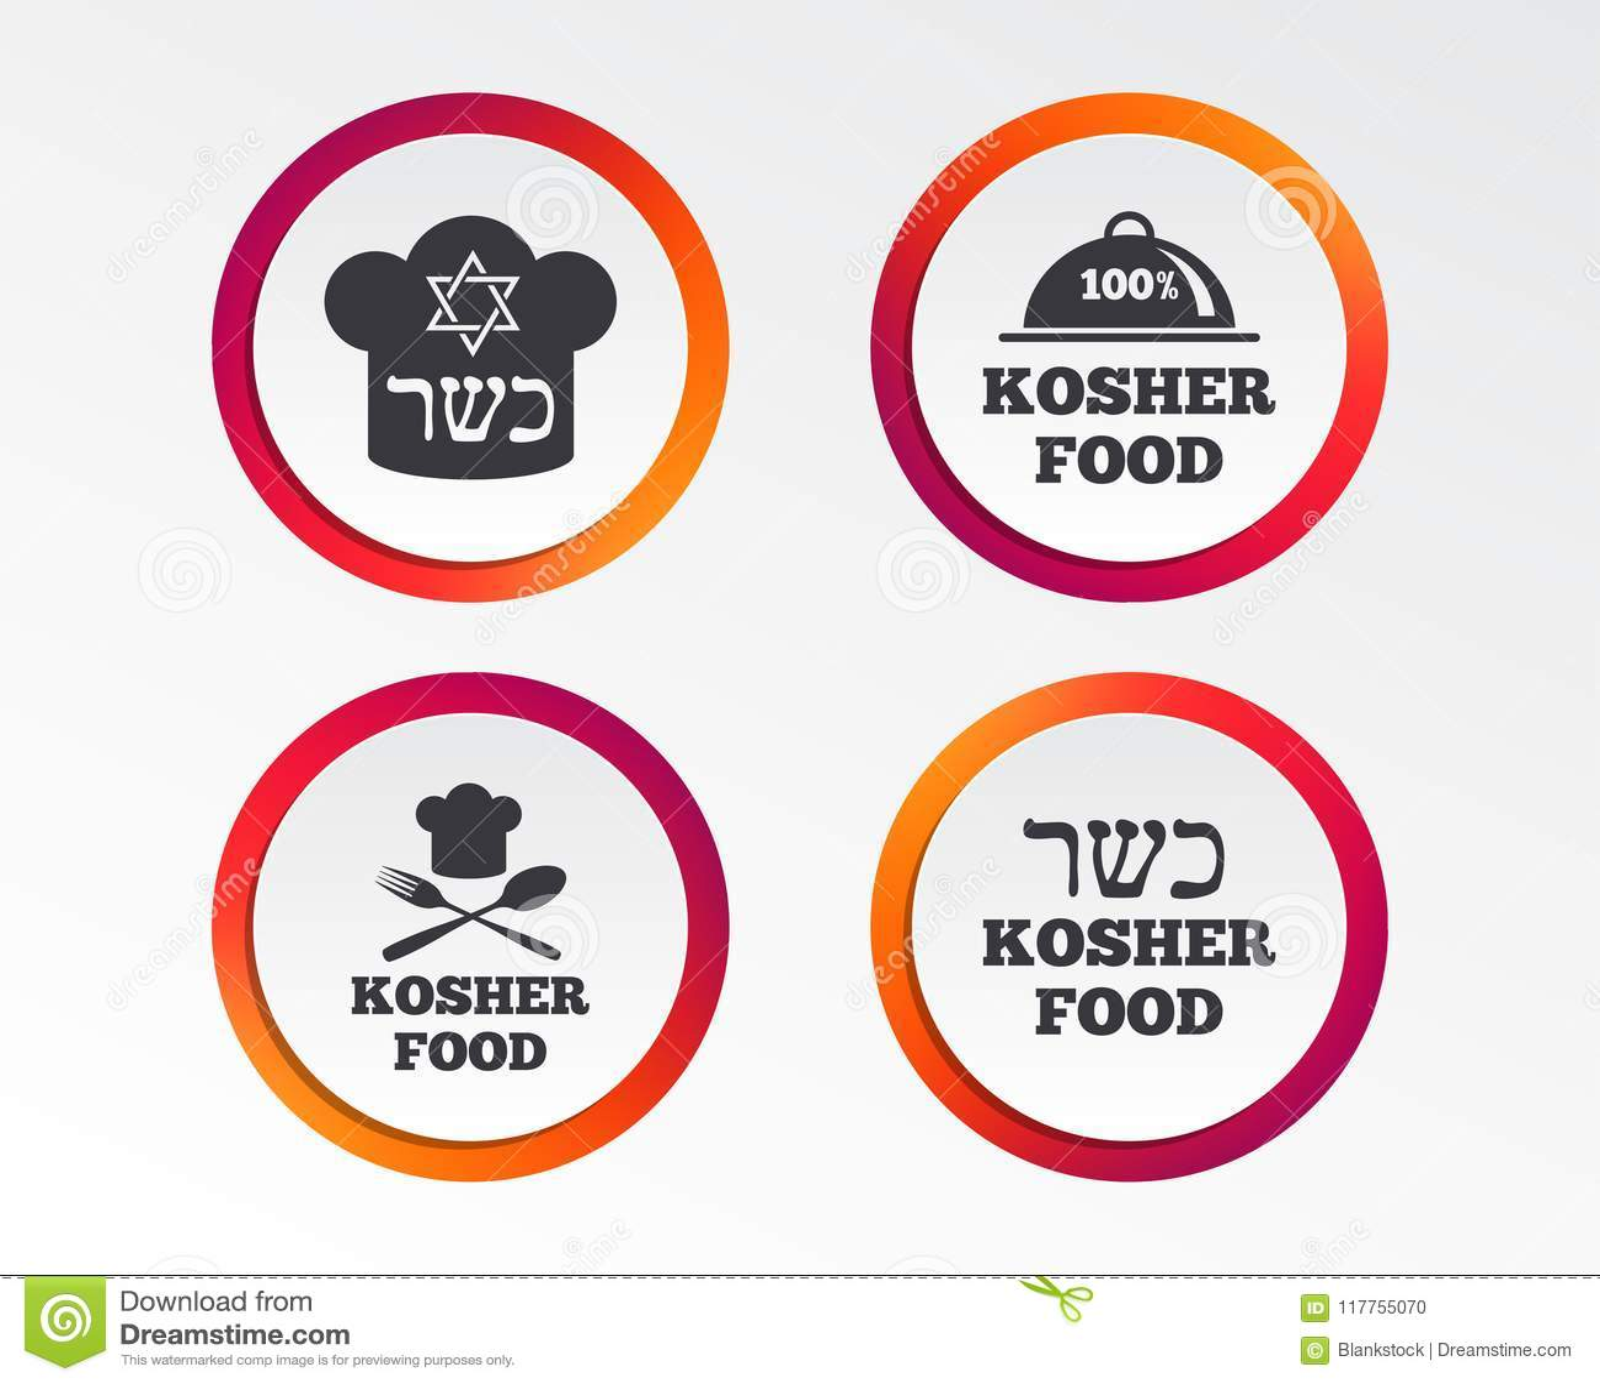 Dieta judia kosher pdf